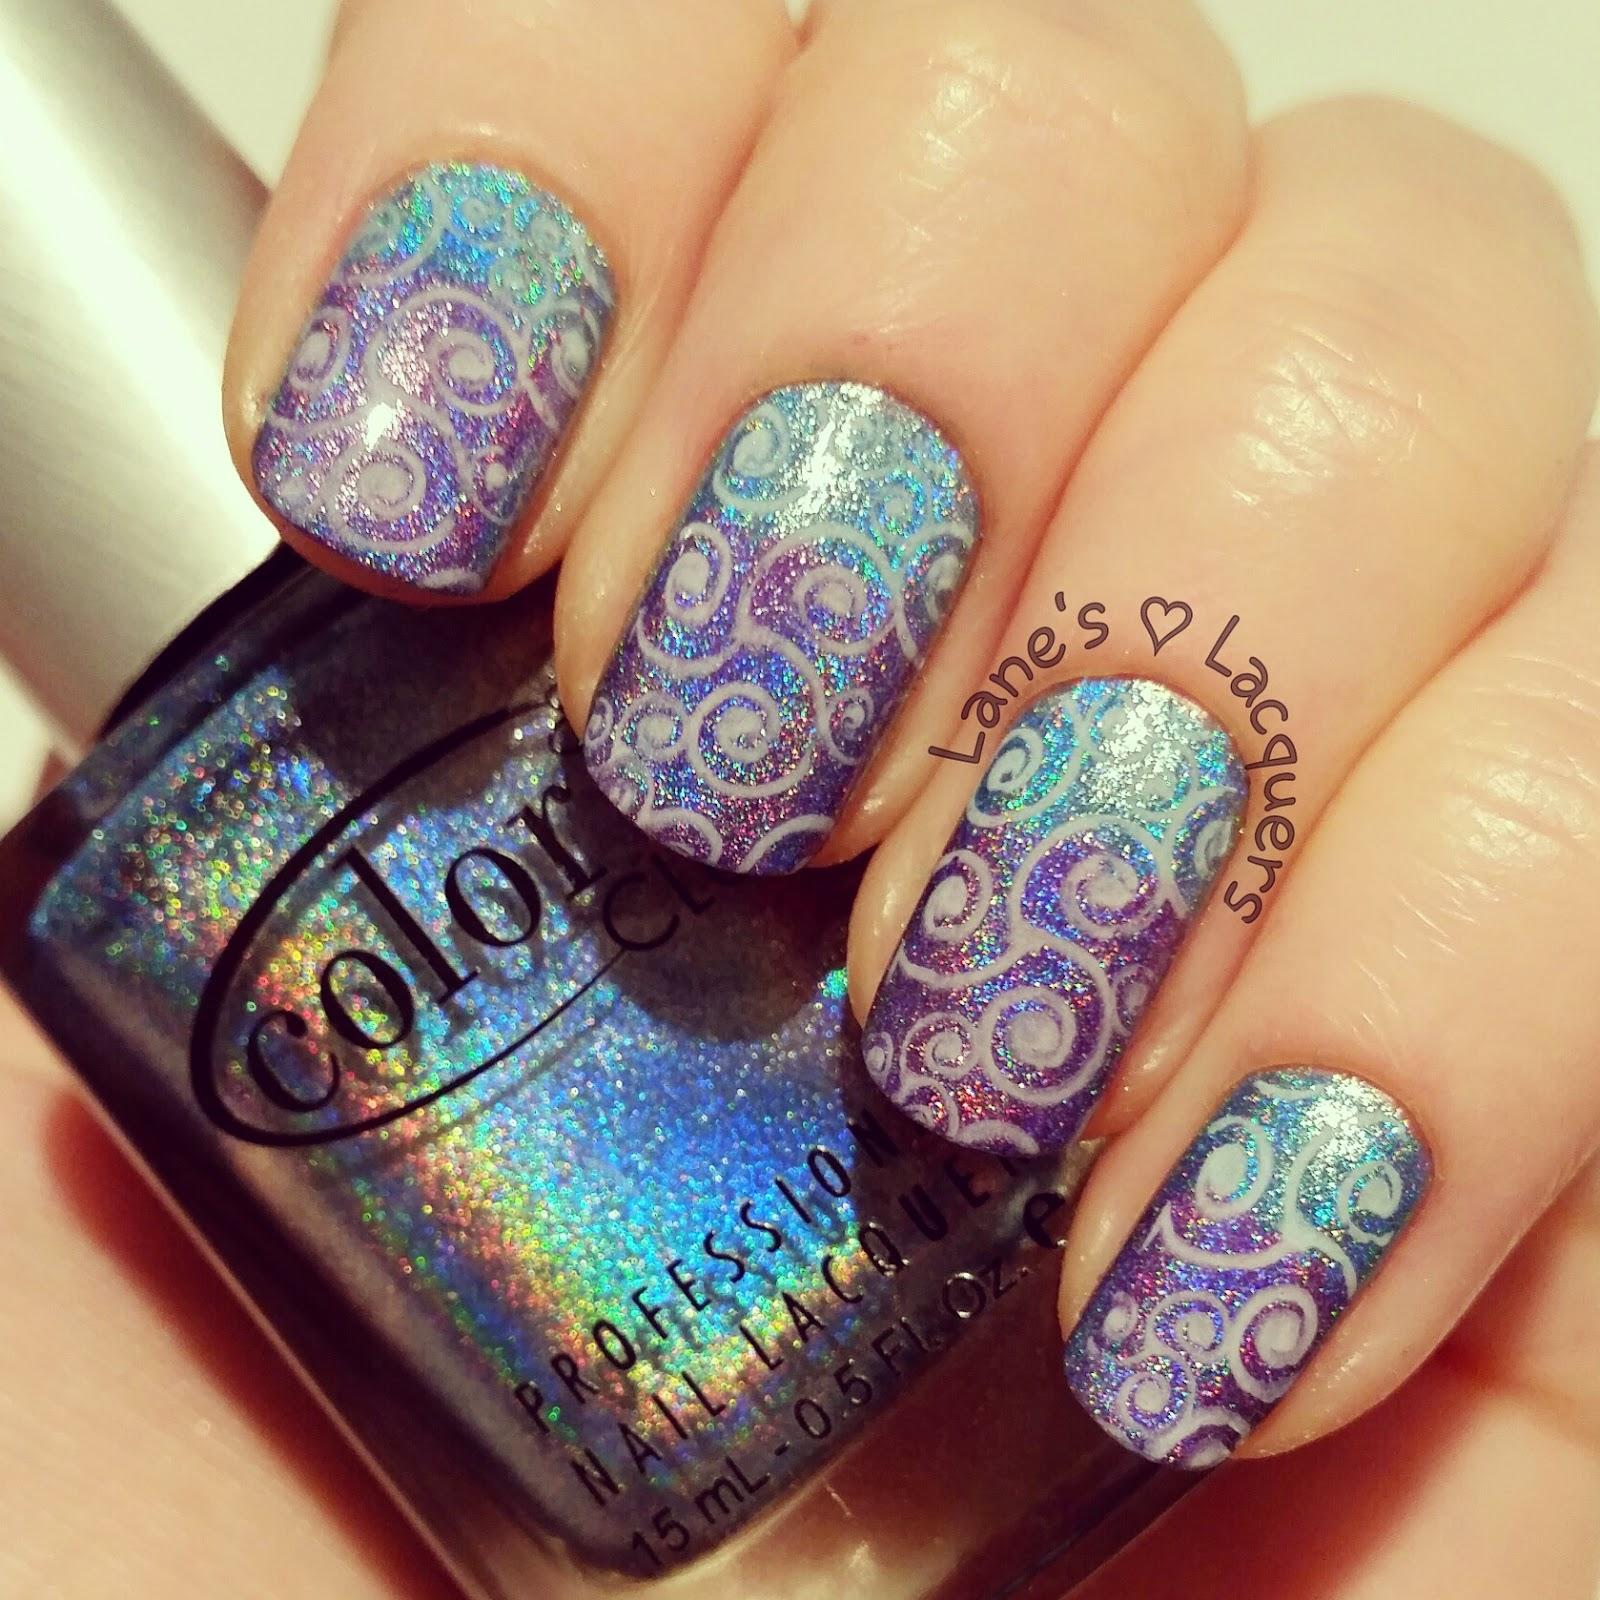 color-club-halo-hues-holo-wave-pattern-nail-art (2)